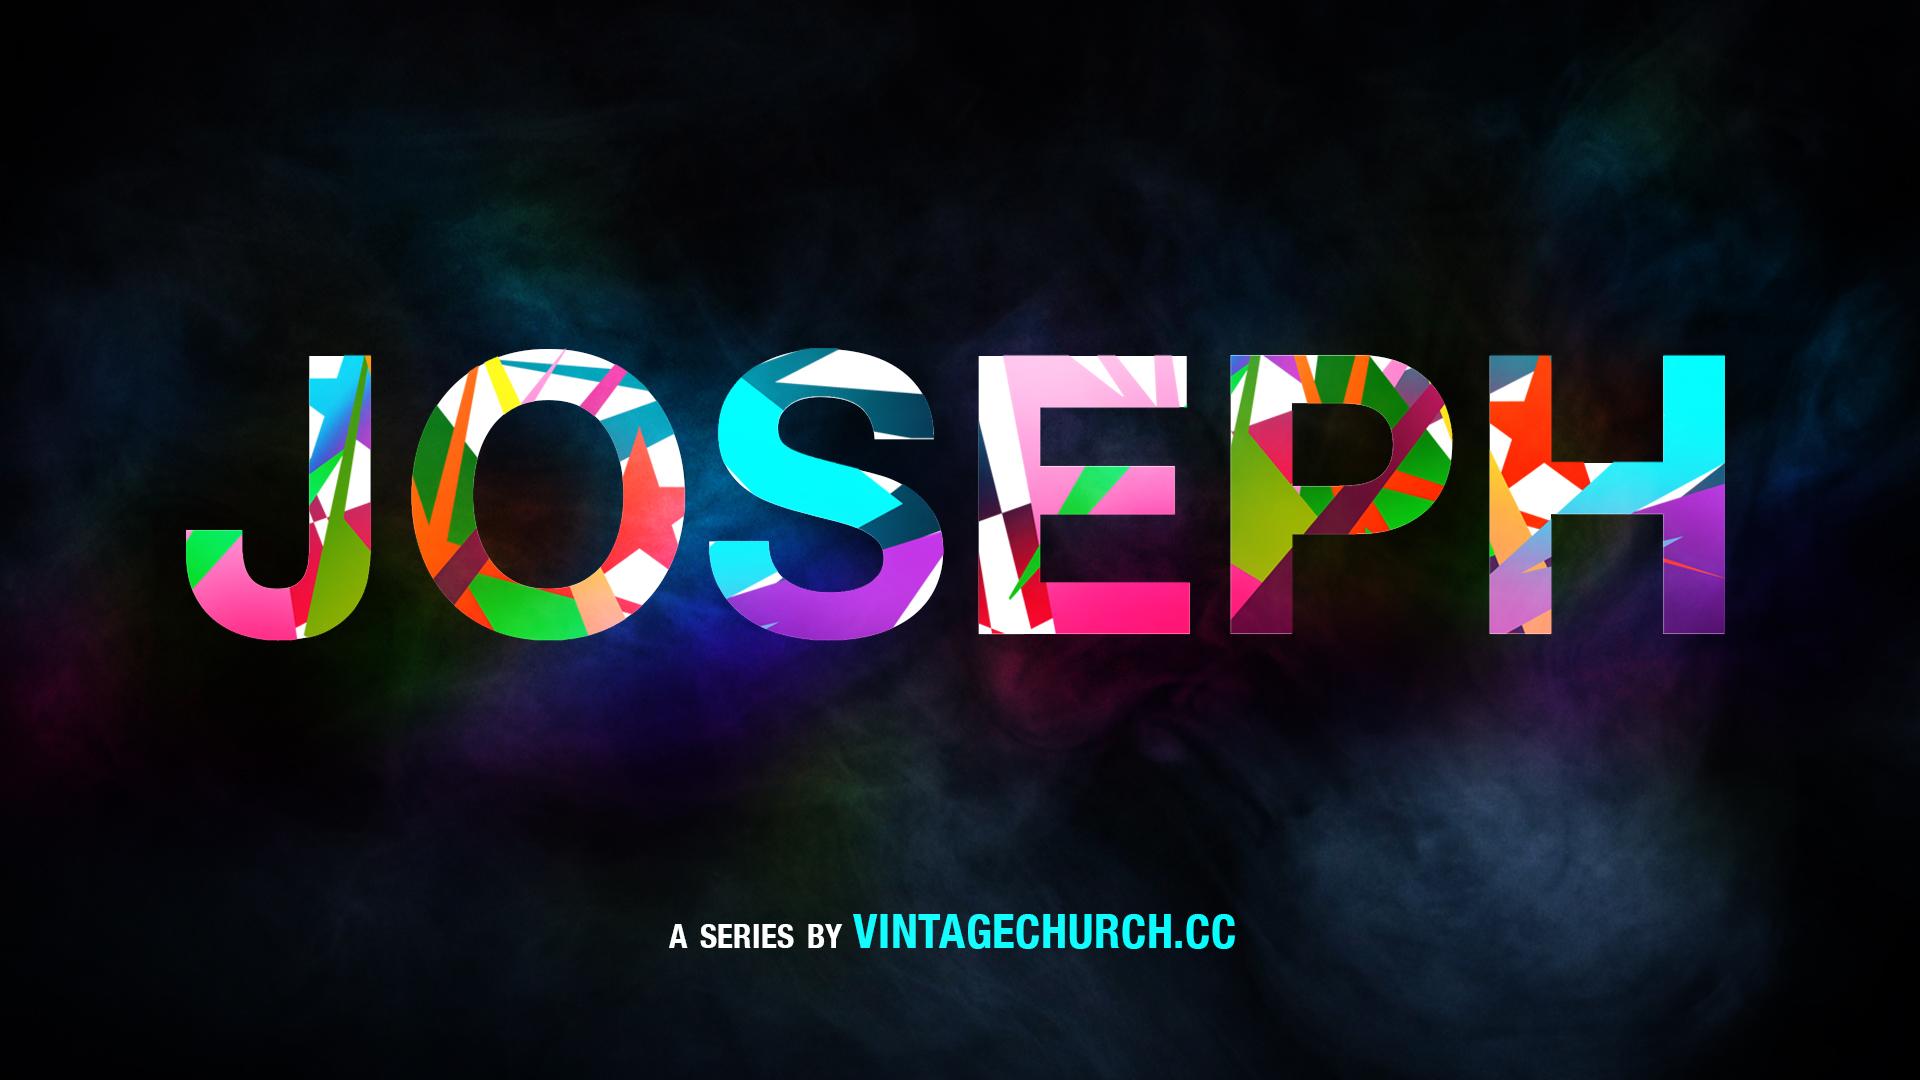 Joseph_title_seriesby.jpg